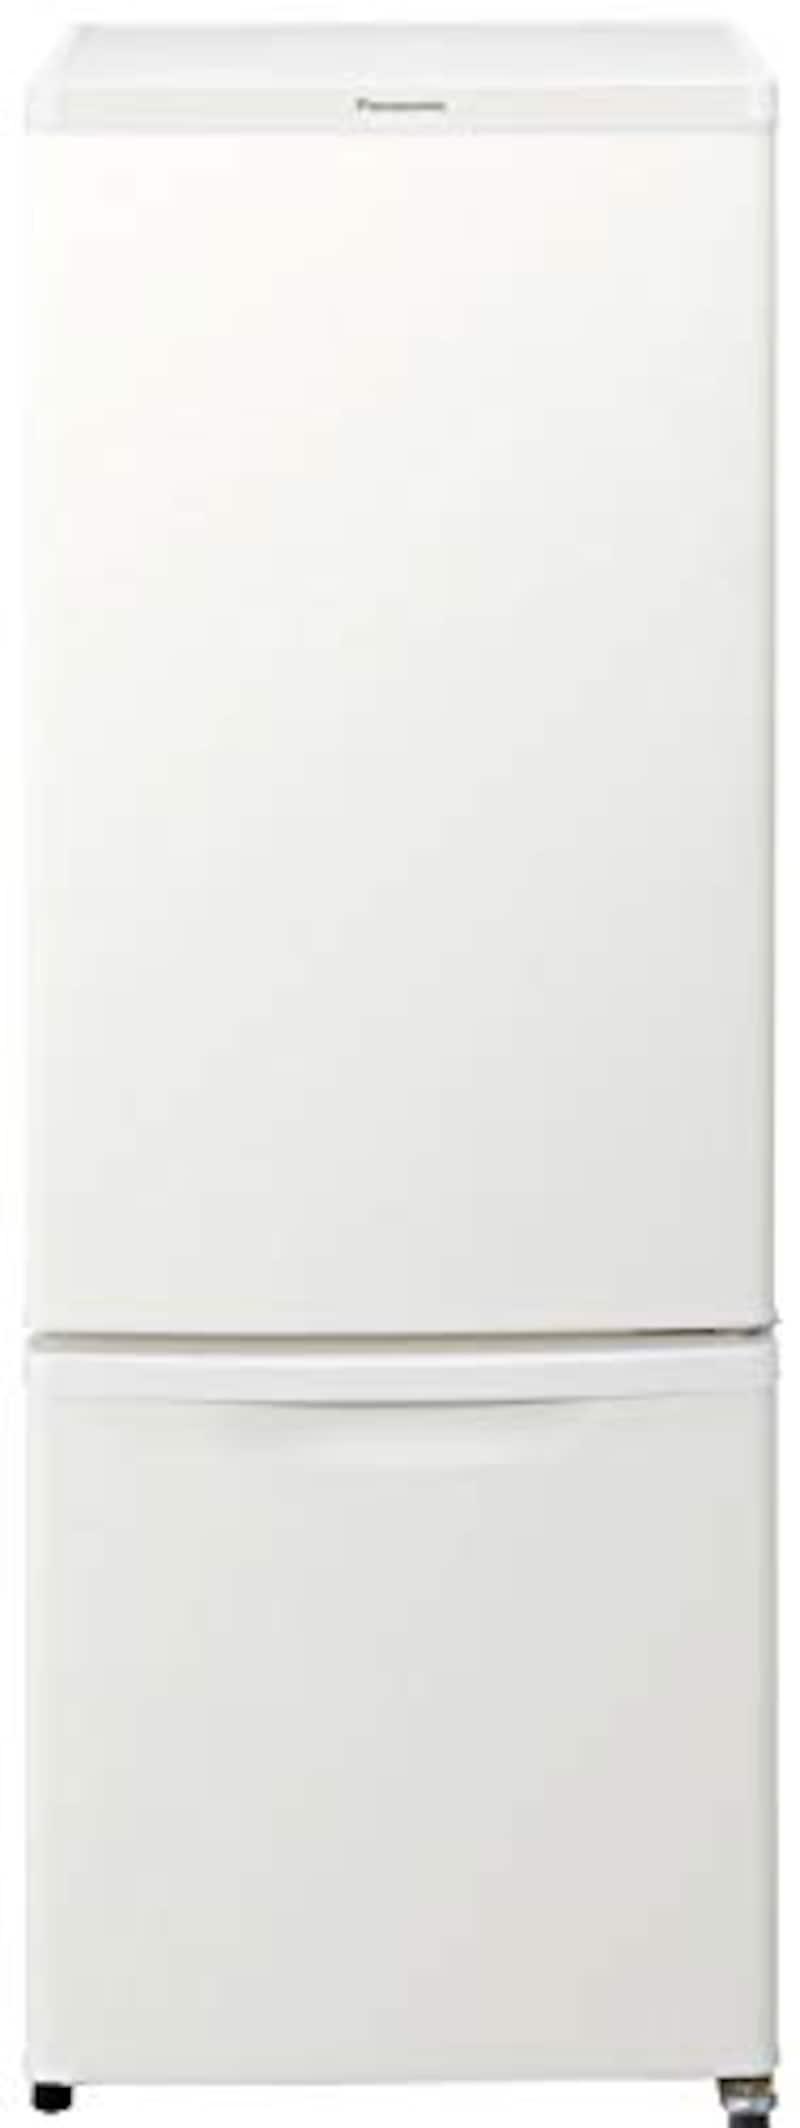 Panasonic(パナソニック),2ドア冷蔵庫 168L,NR-B17DW-W